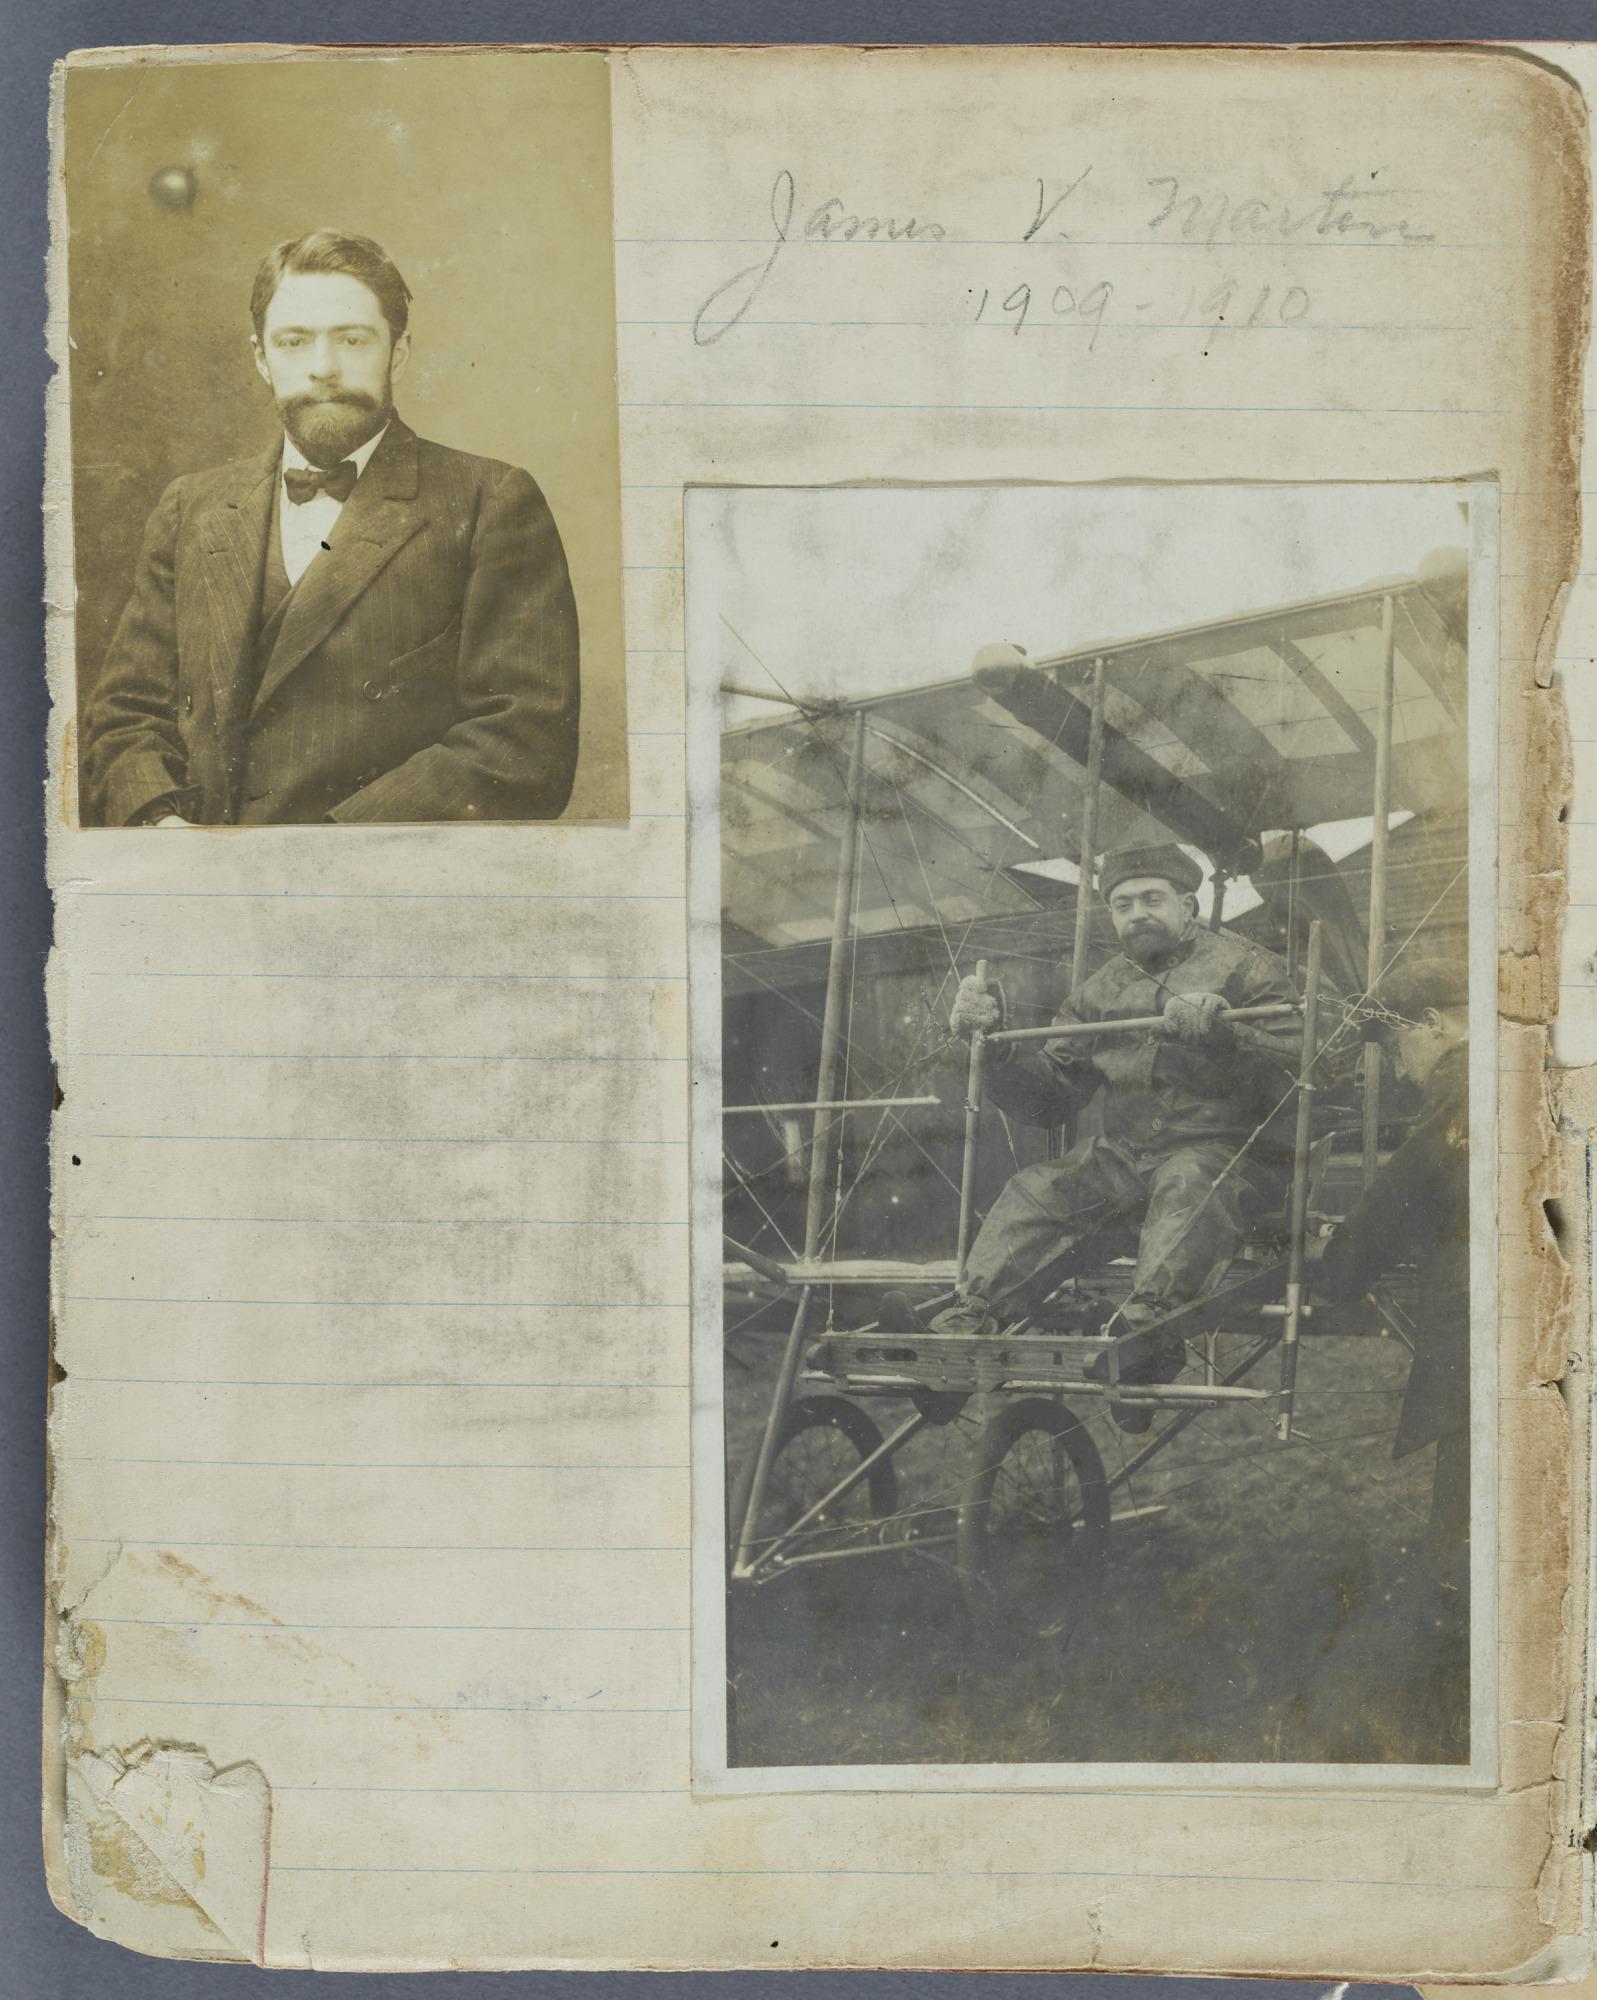 James V. Martin Scrapbook